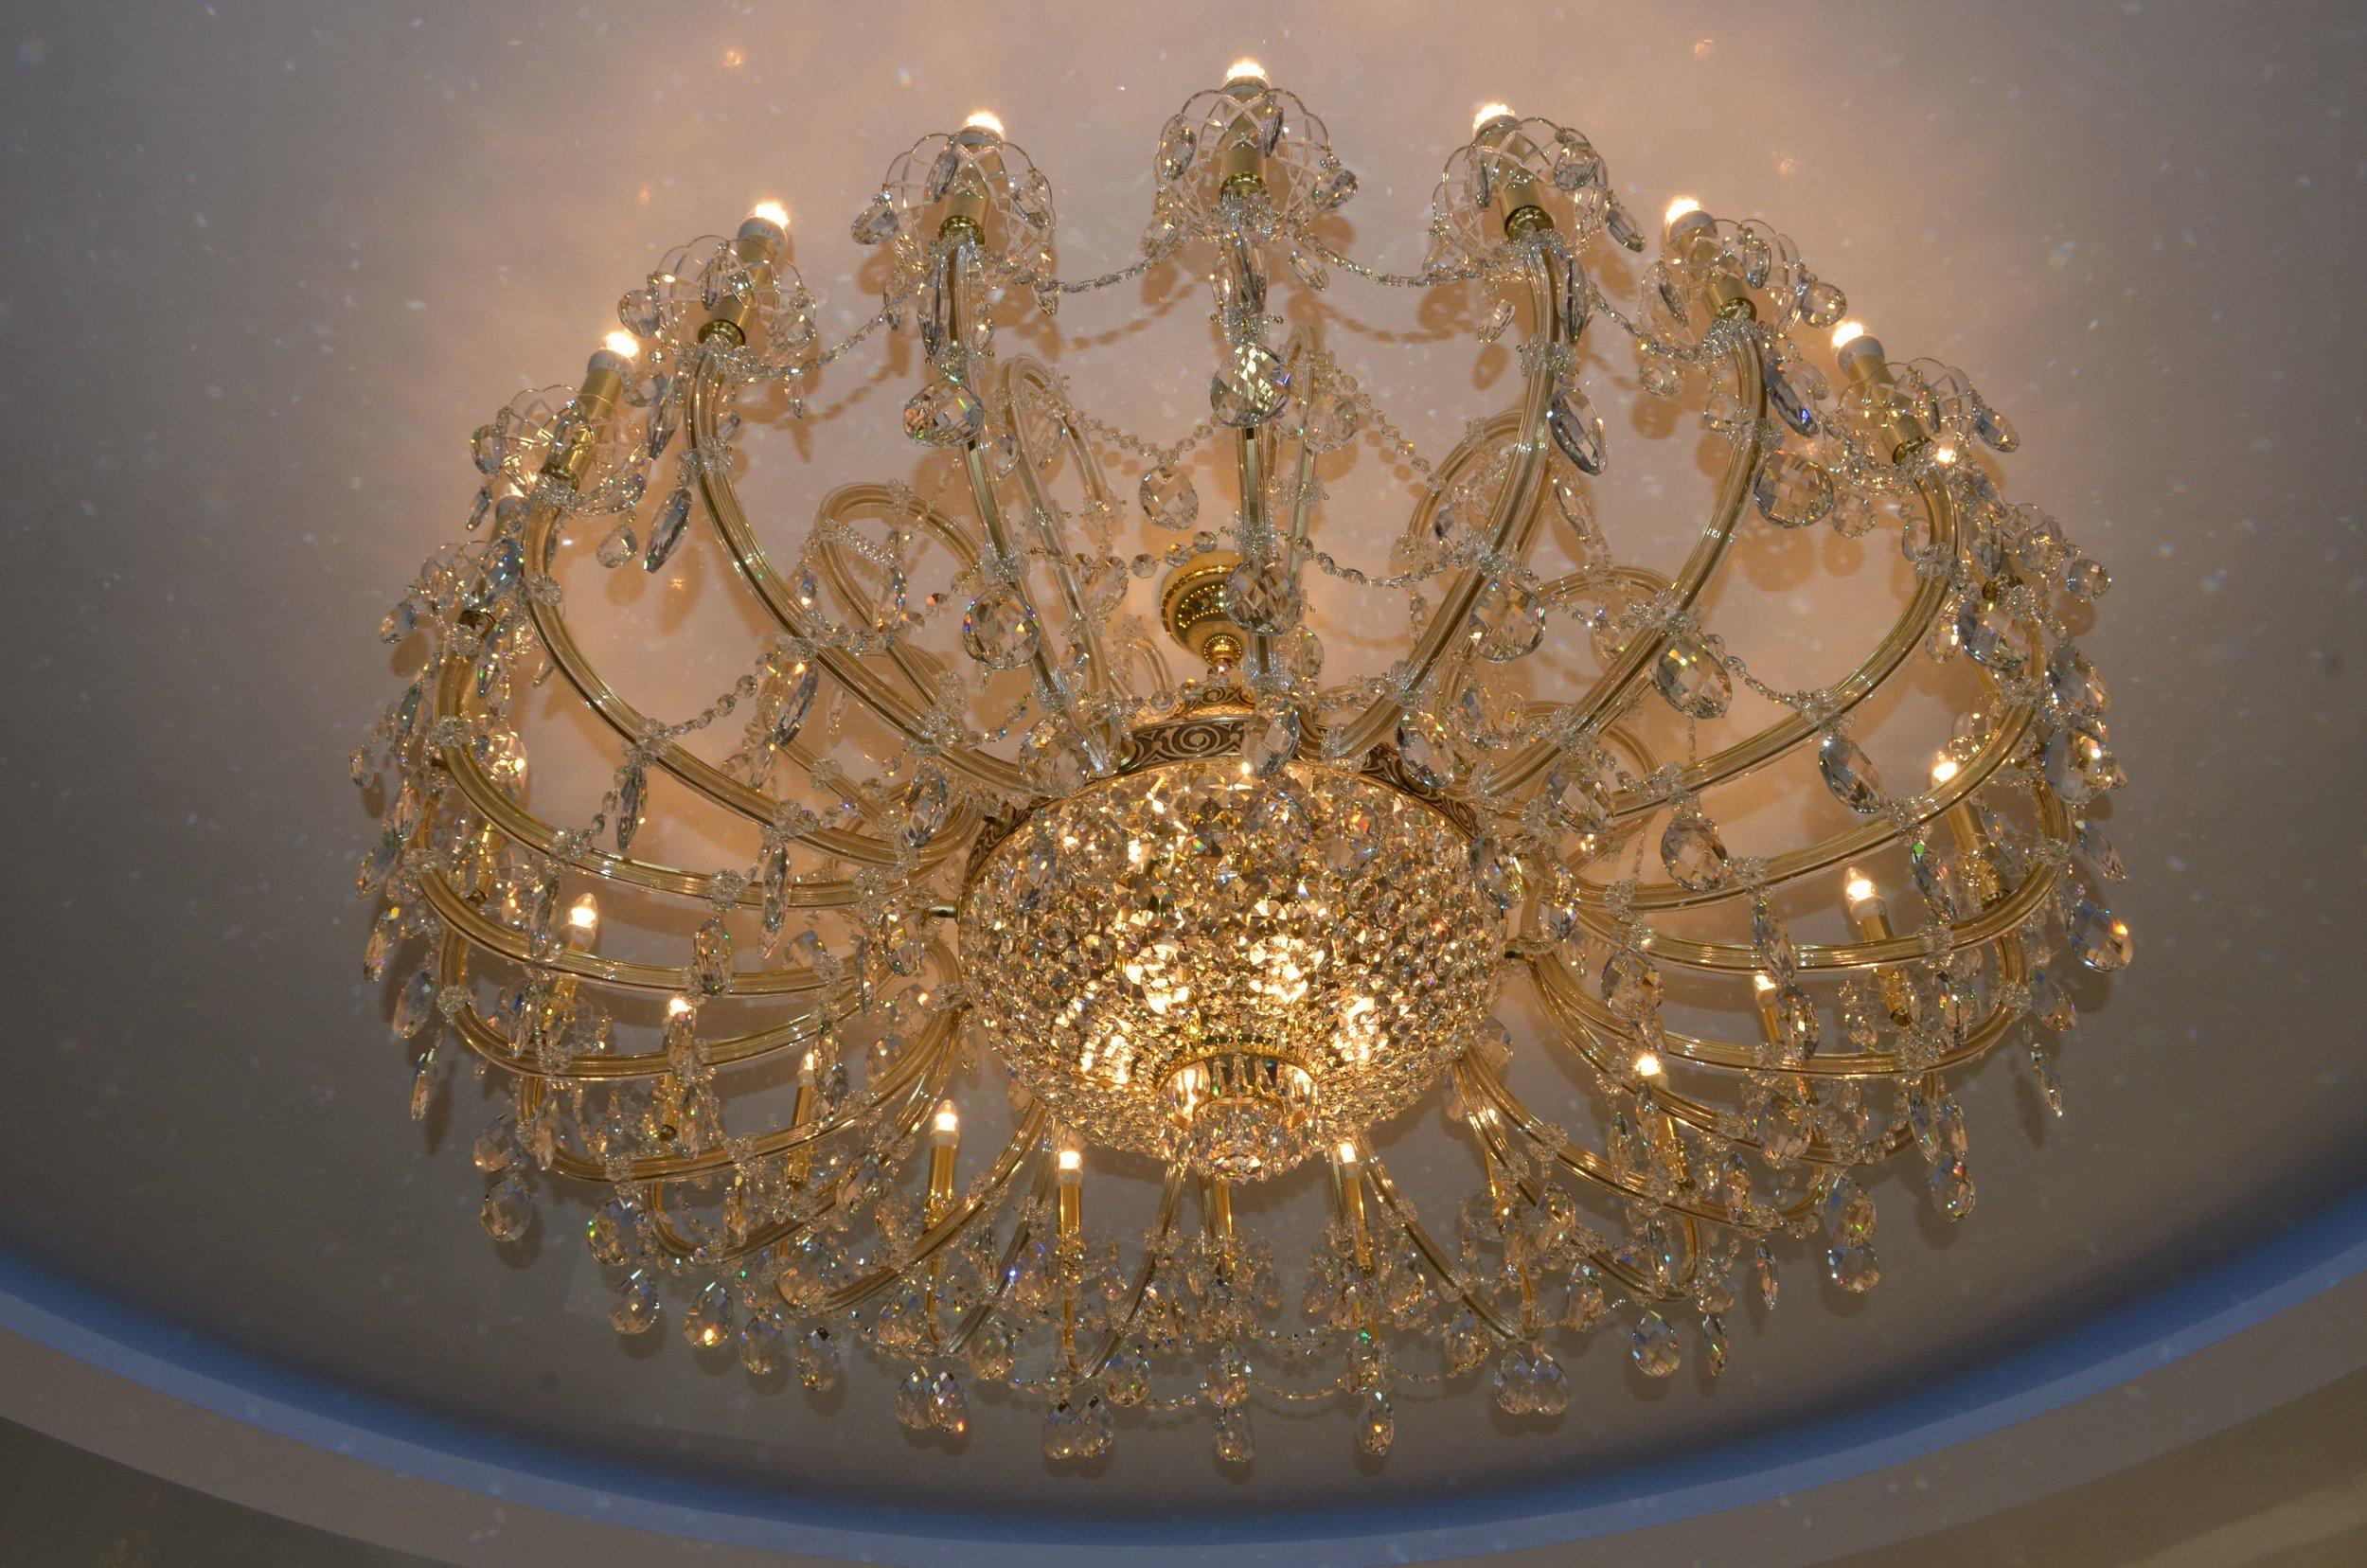 wranovsky-chandeliers-romania-3.JPG